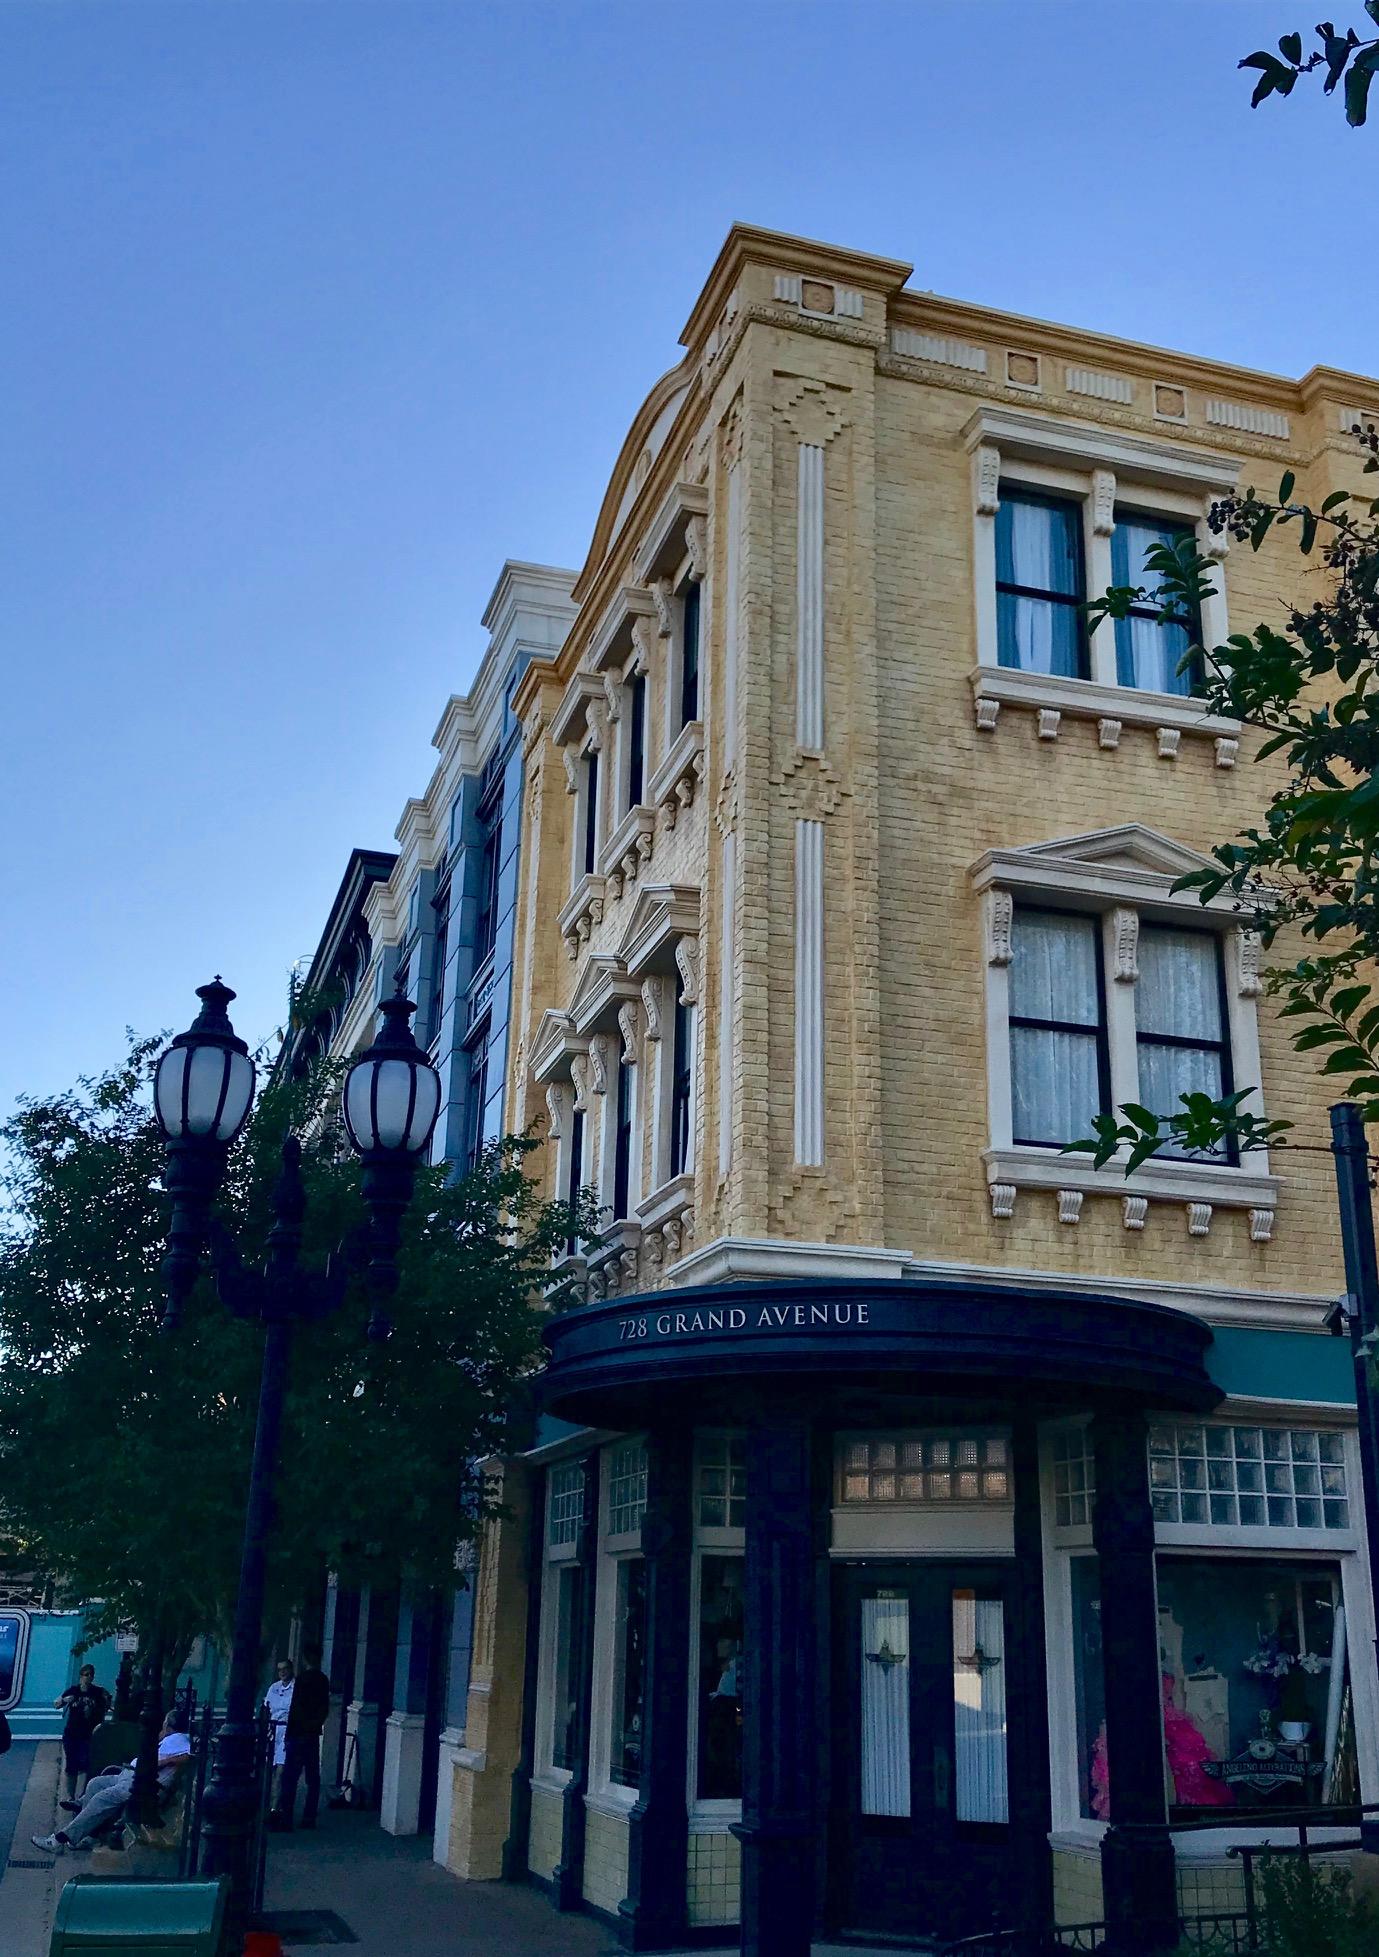 Grand Avenue shops